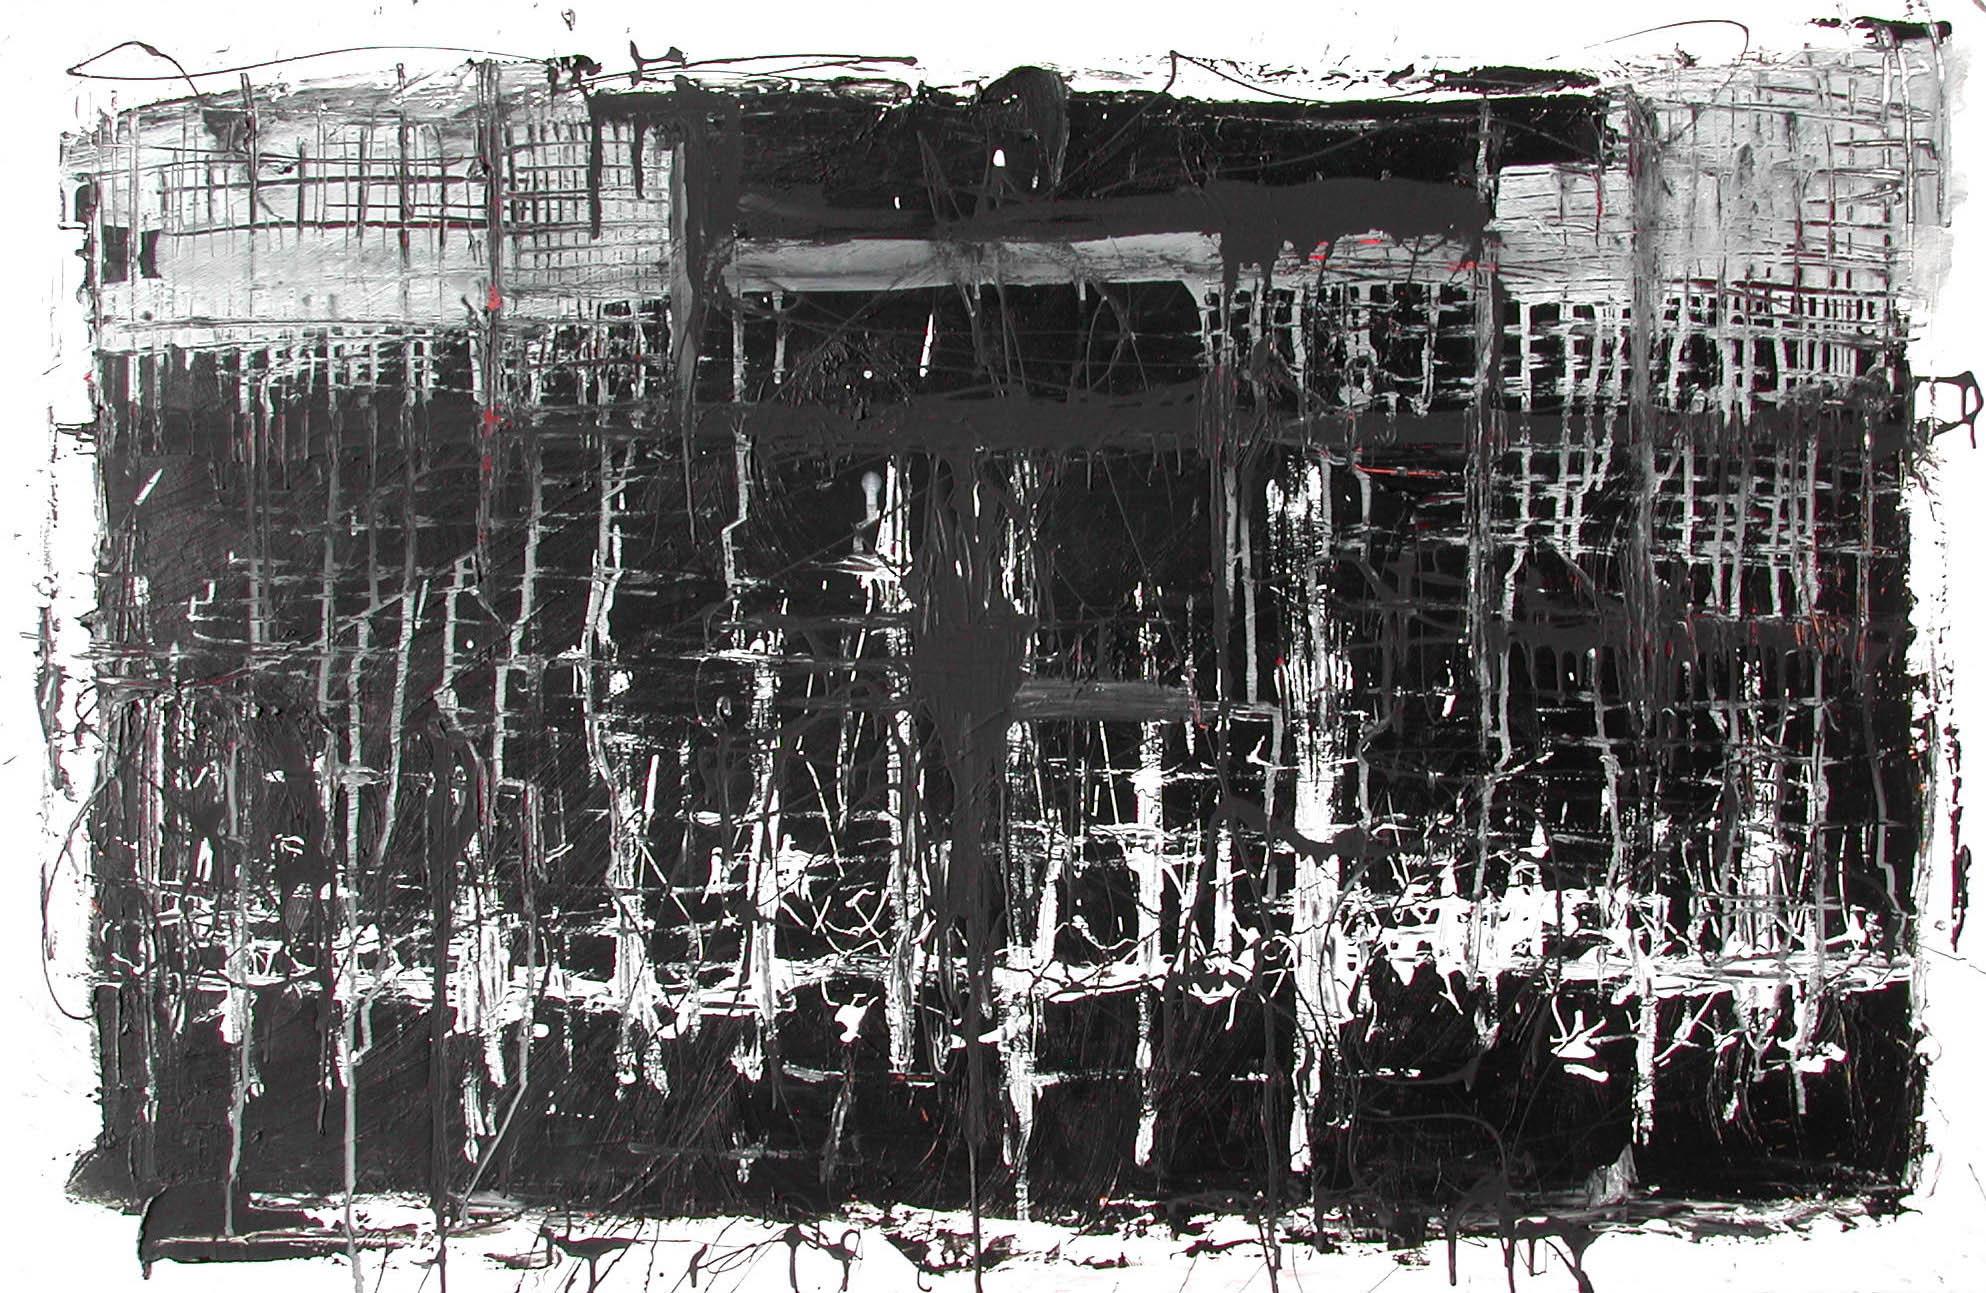 Nightfall, 2003Acrylic on canvas, 30 x 46 inches